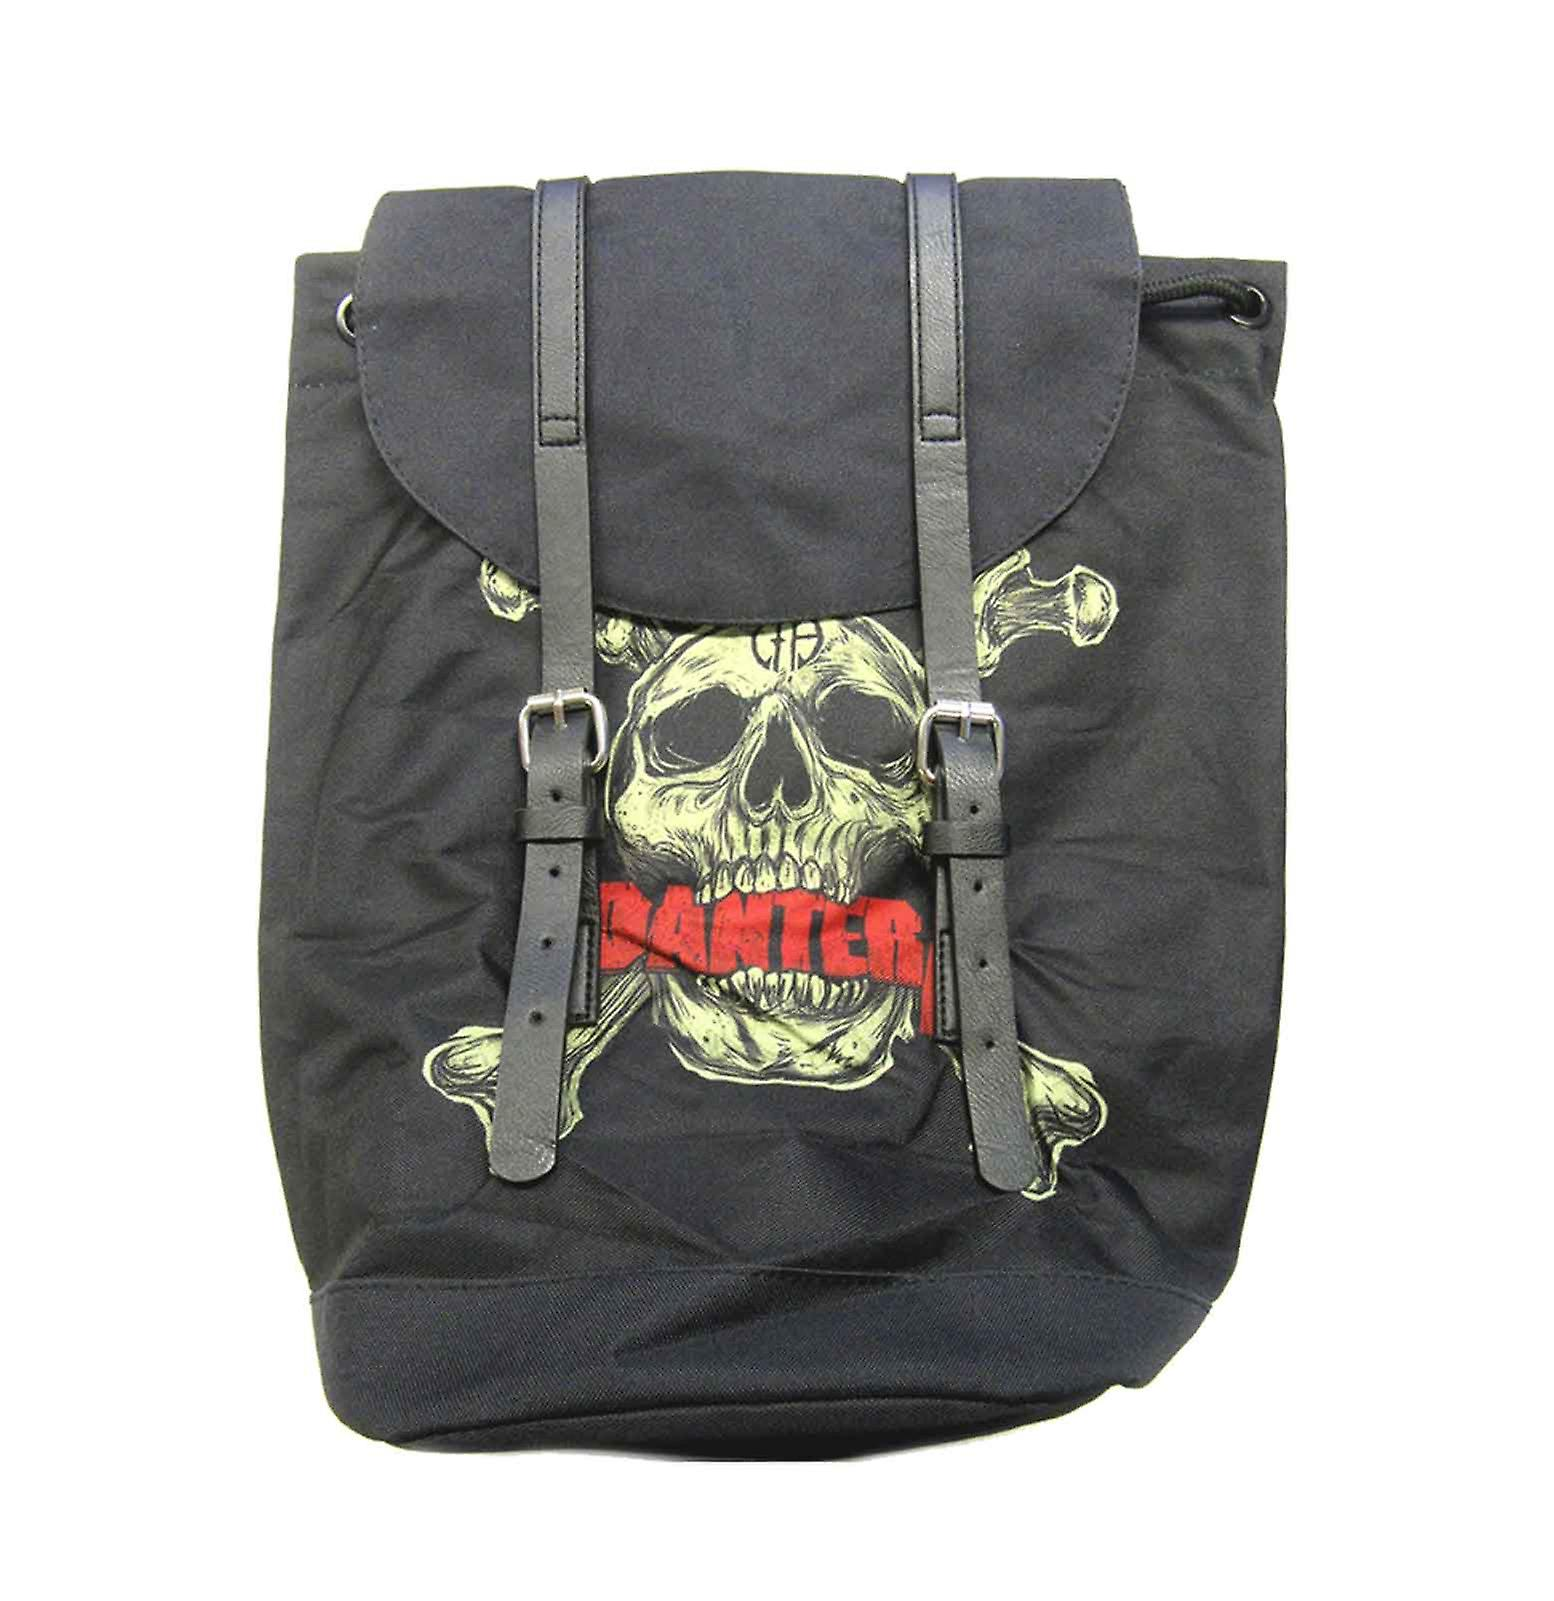 Pantera ryggsekk Heritage bag Skull N Bones band logo nye